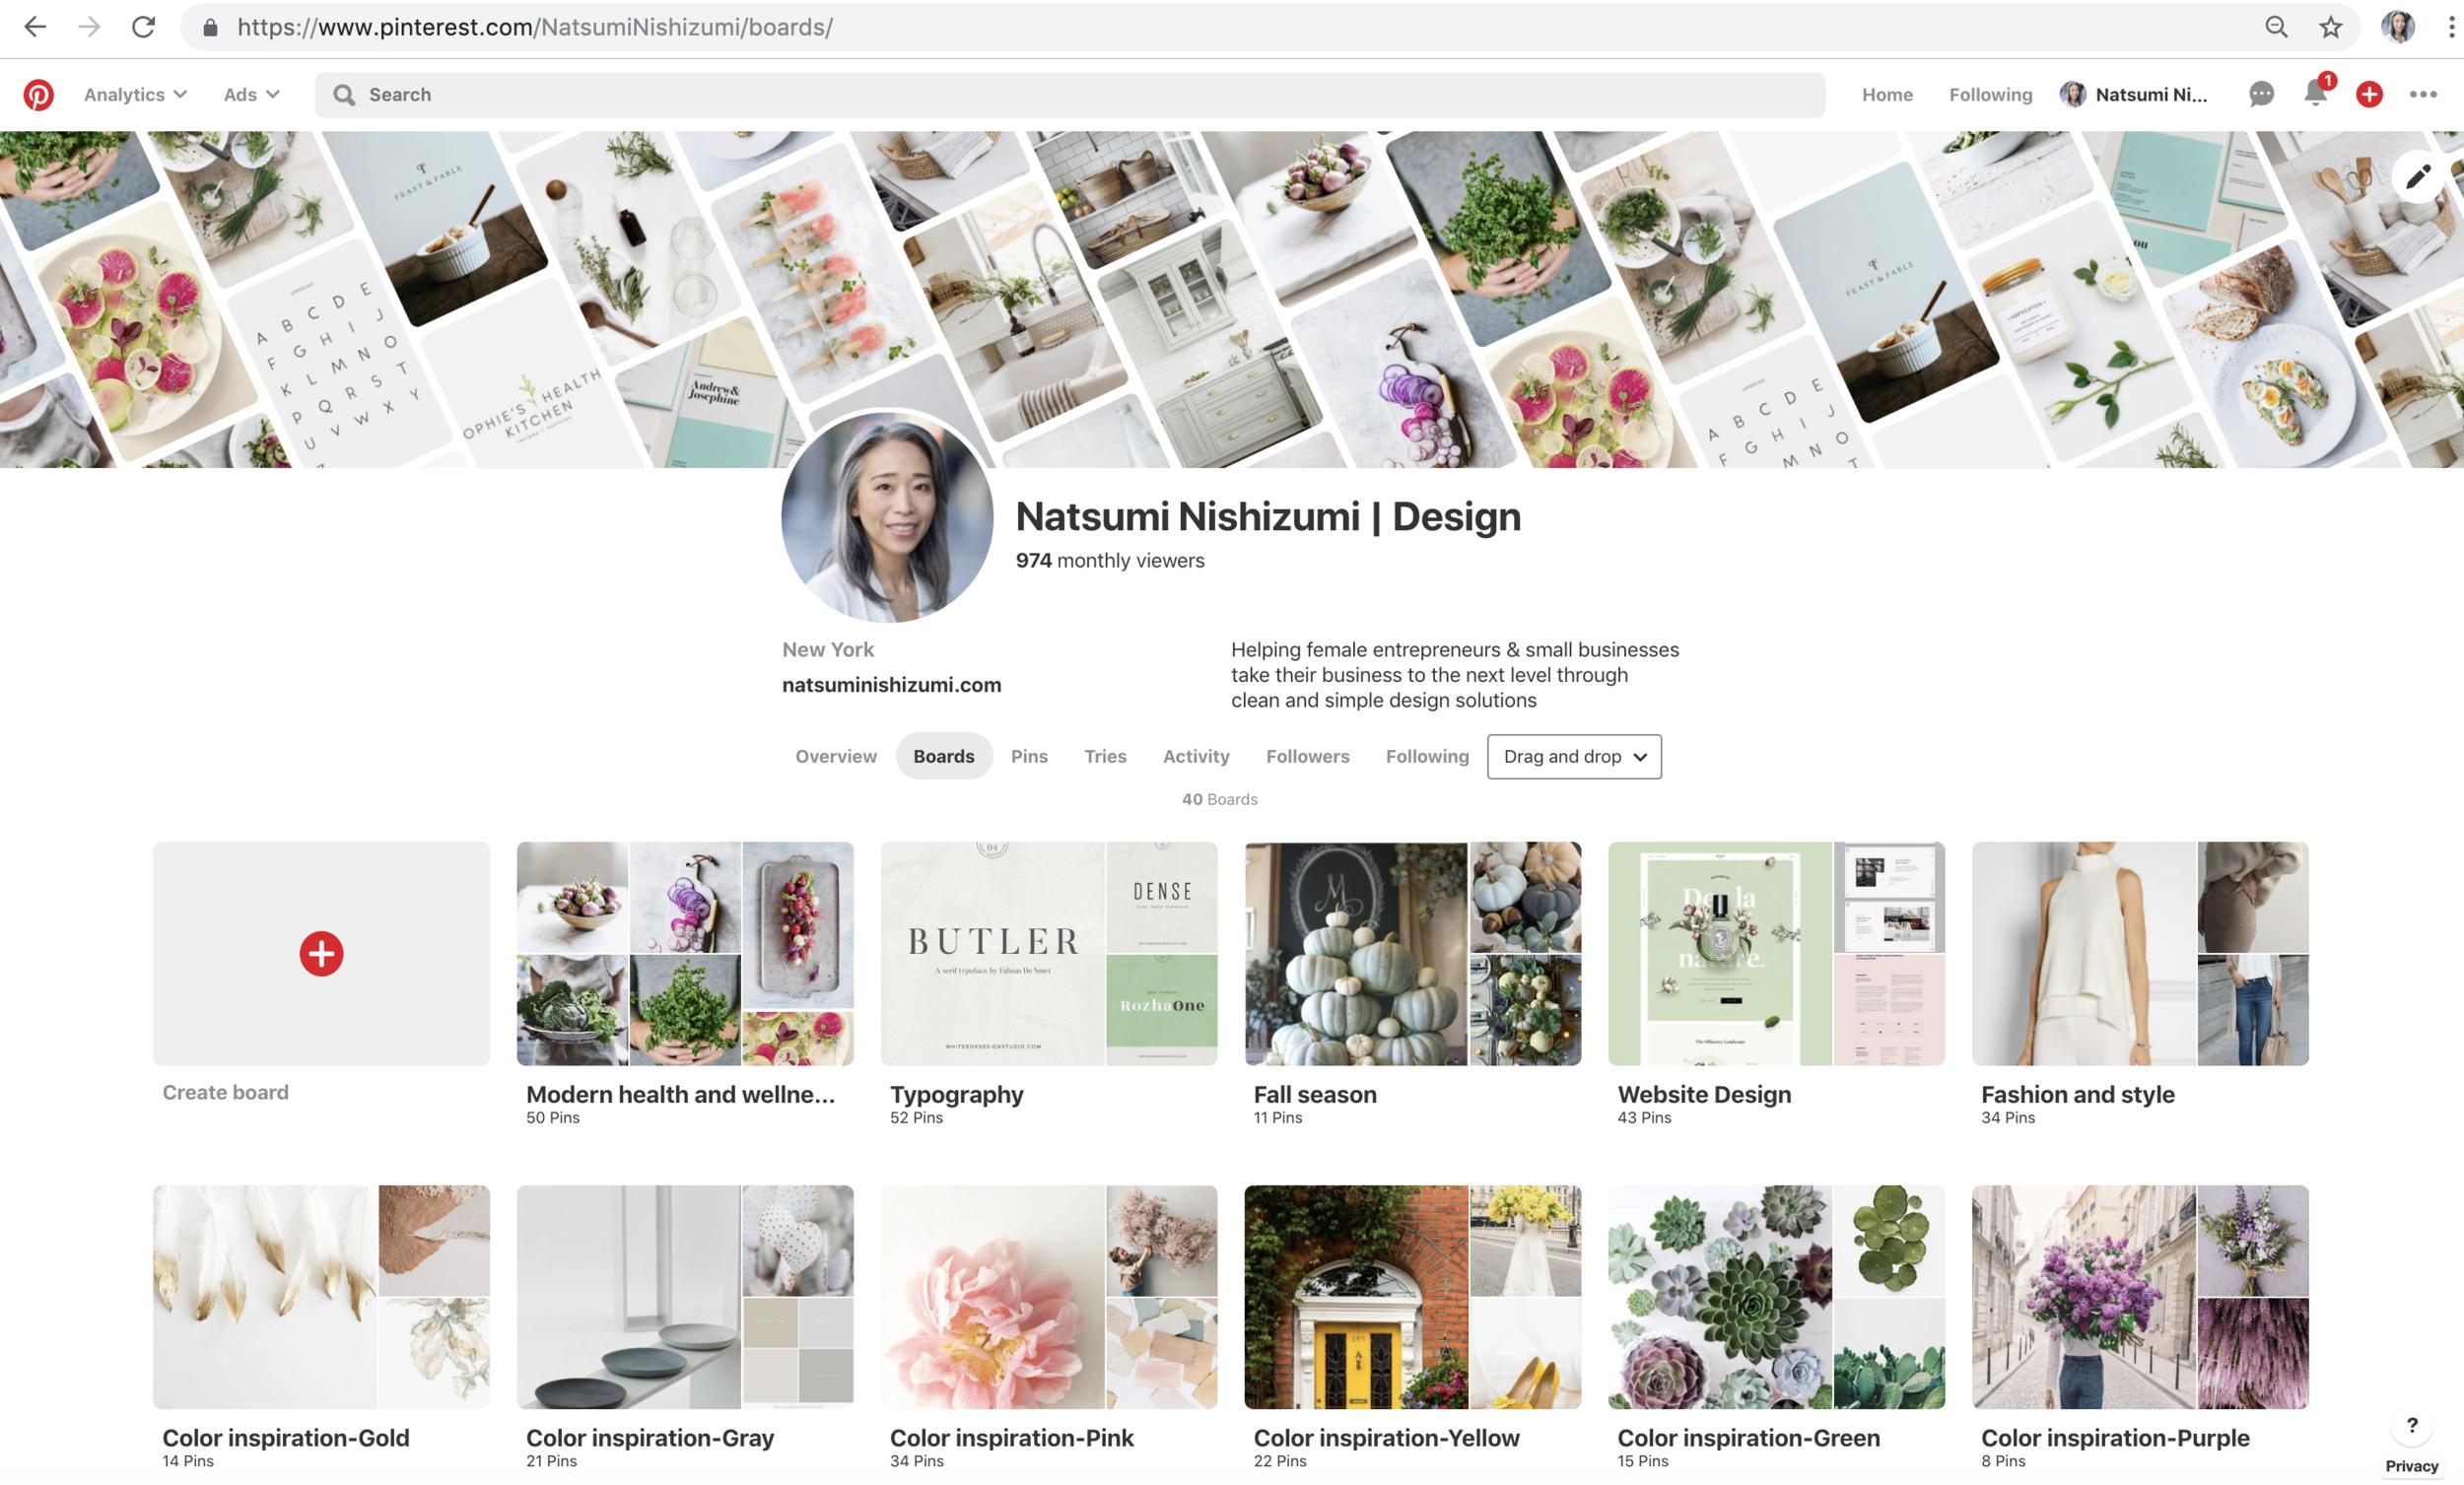 Pinterest board examples by Natsumi Nishizumi